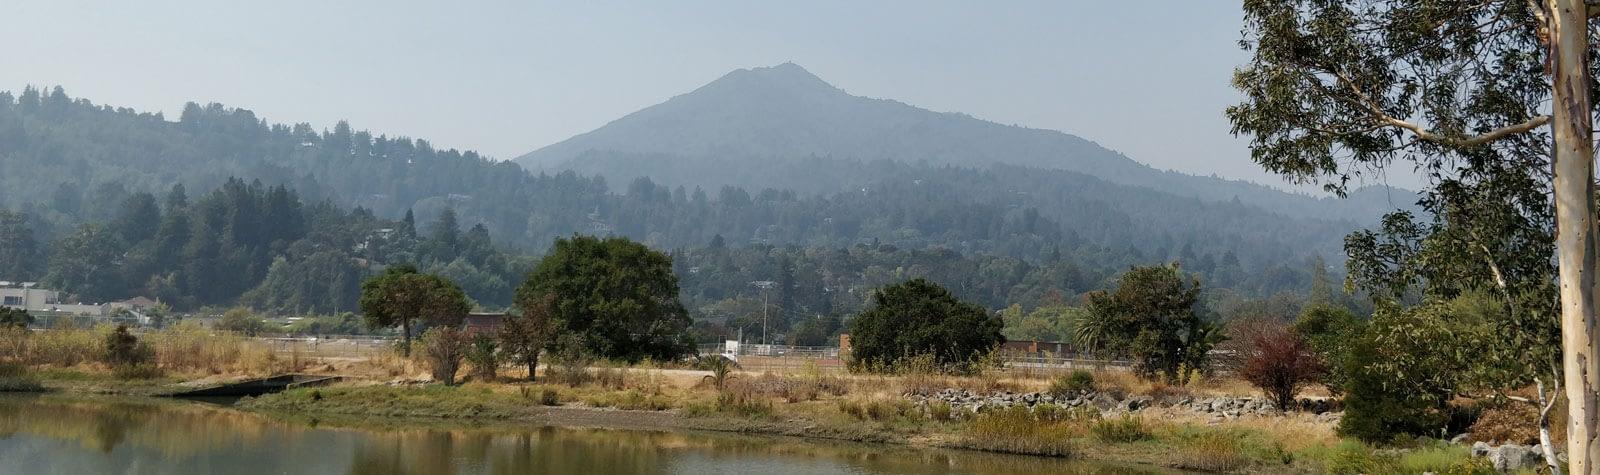 Day 32 – Samuel Taylor State Park to Marin Headlands Hostel (48 KM)